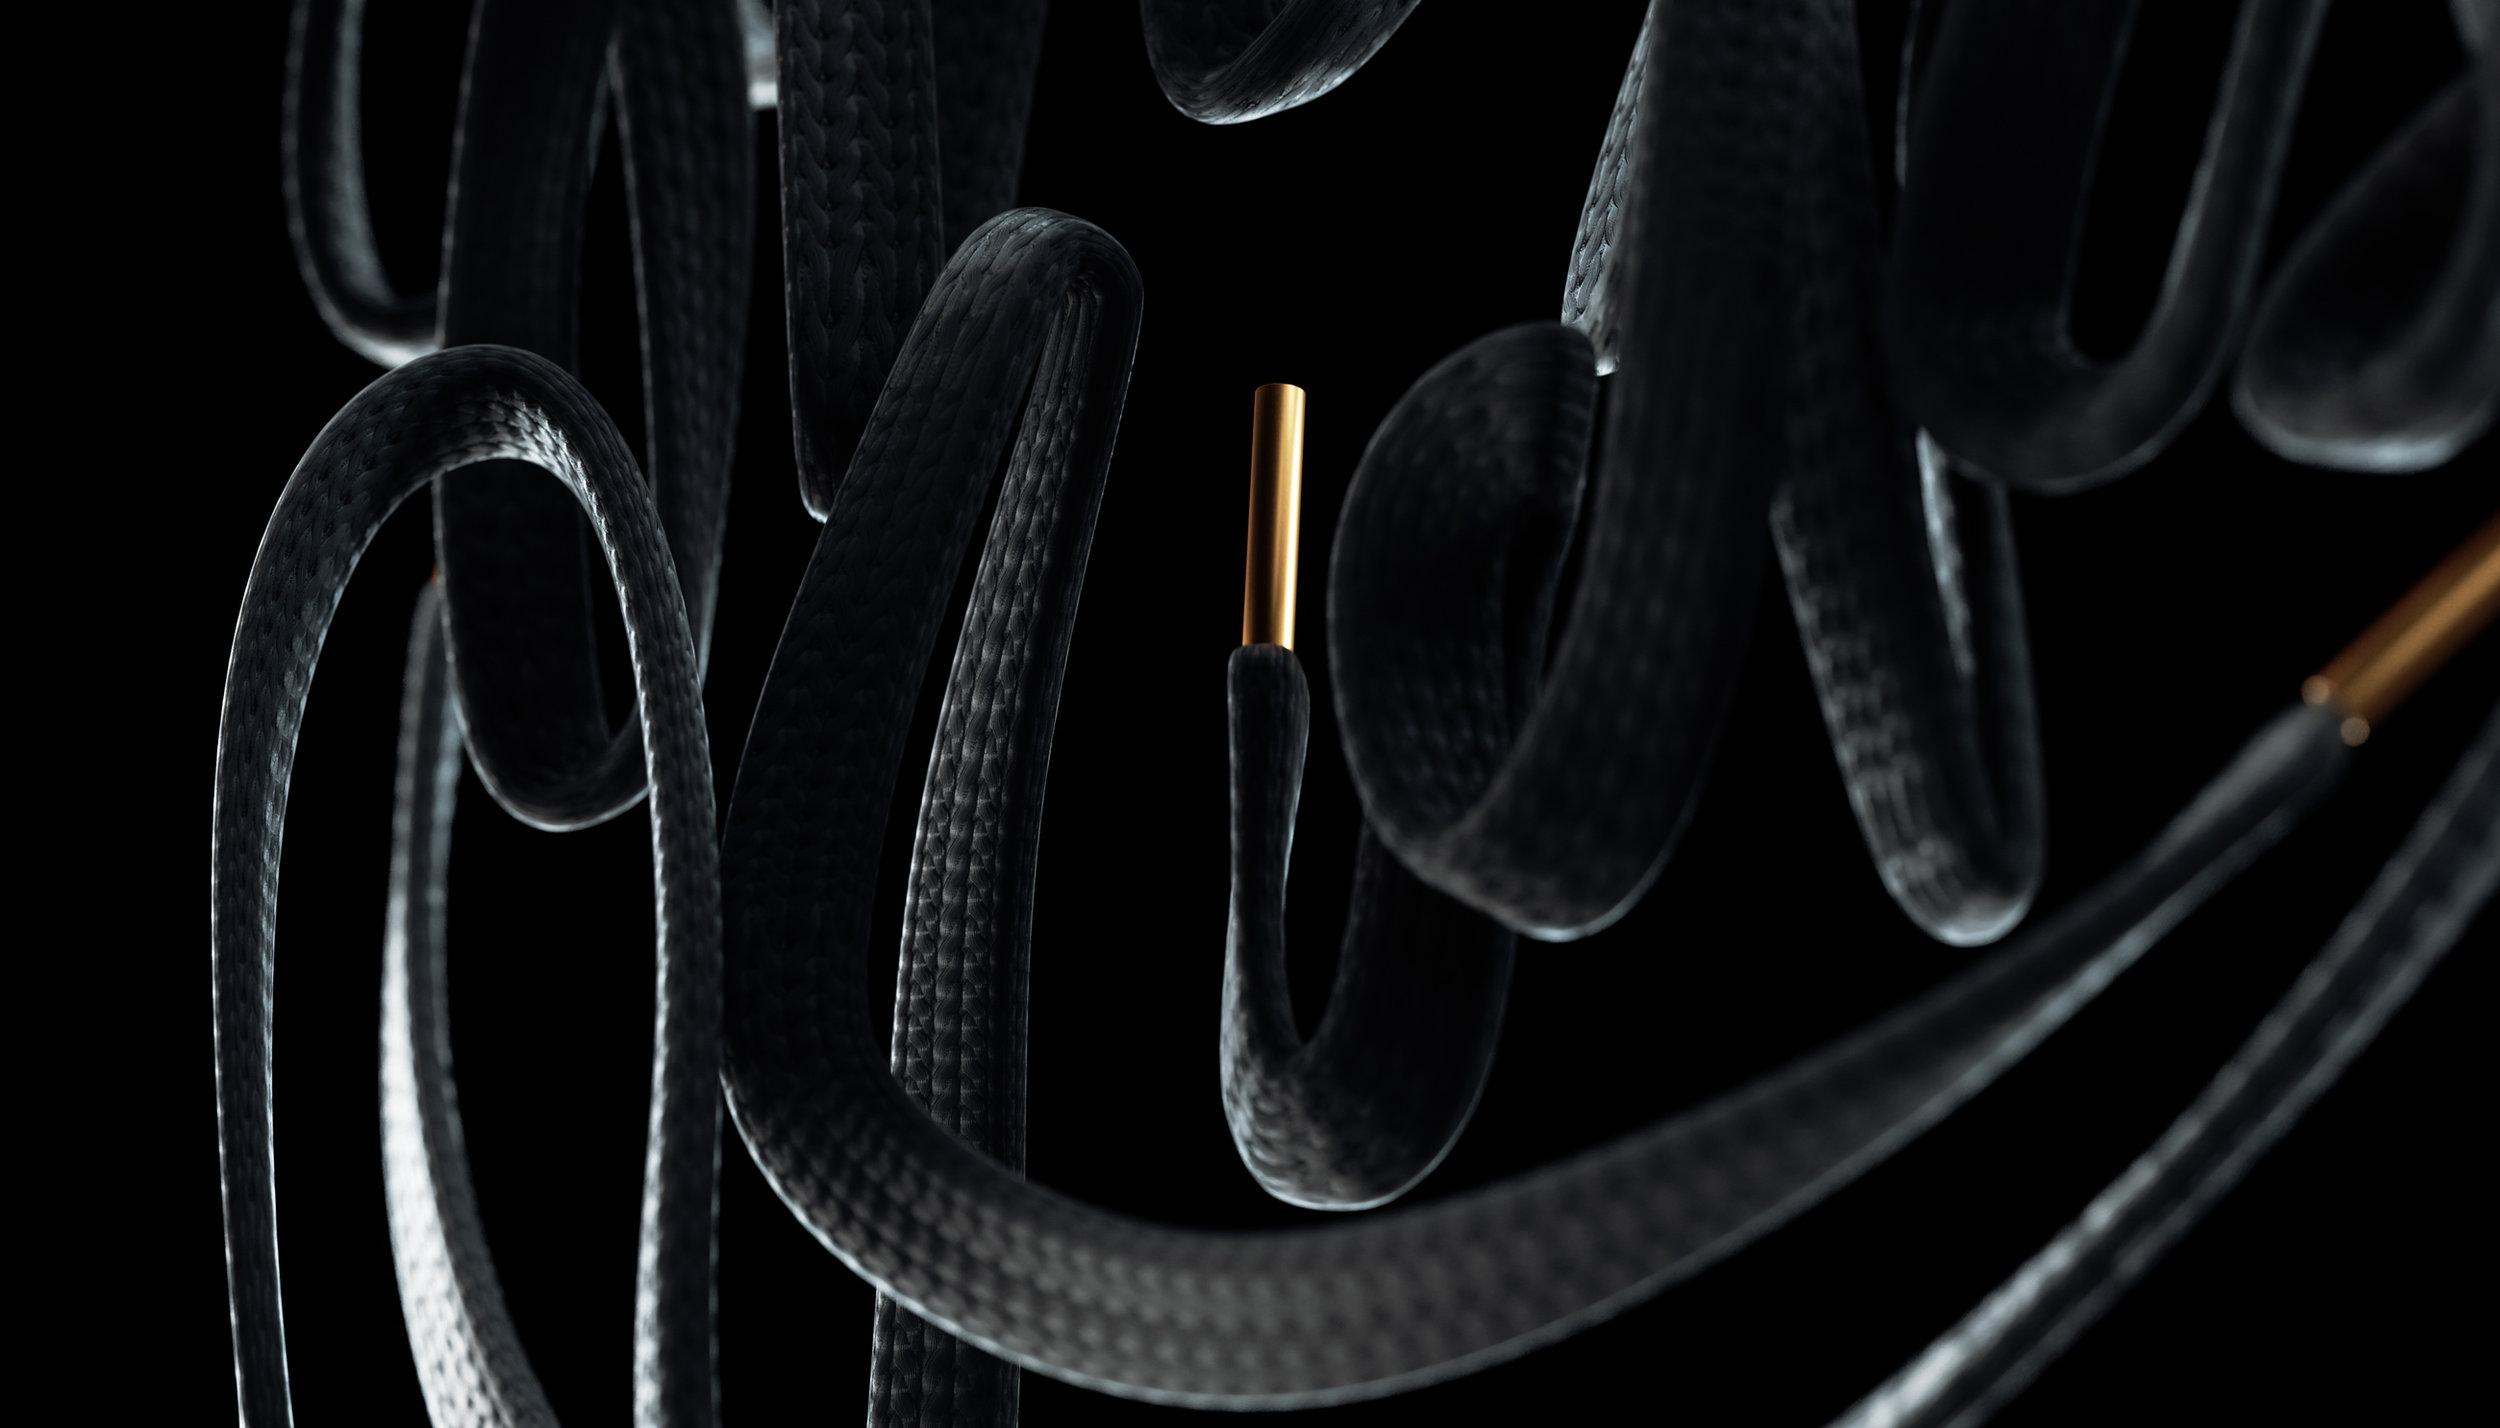 KissMyKicks-3DTypography_ShoeLace_BlackOnBlack_BenFearnley-DOF_Landscape-2.jpg